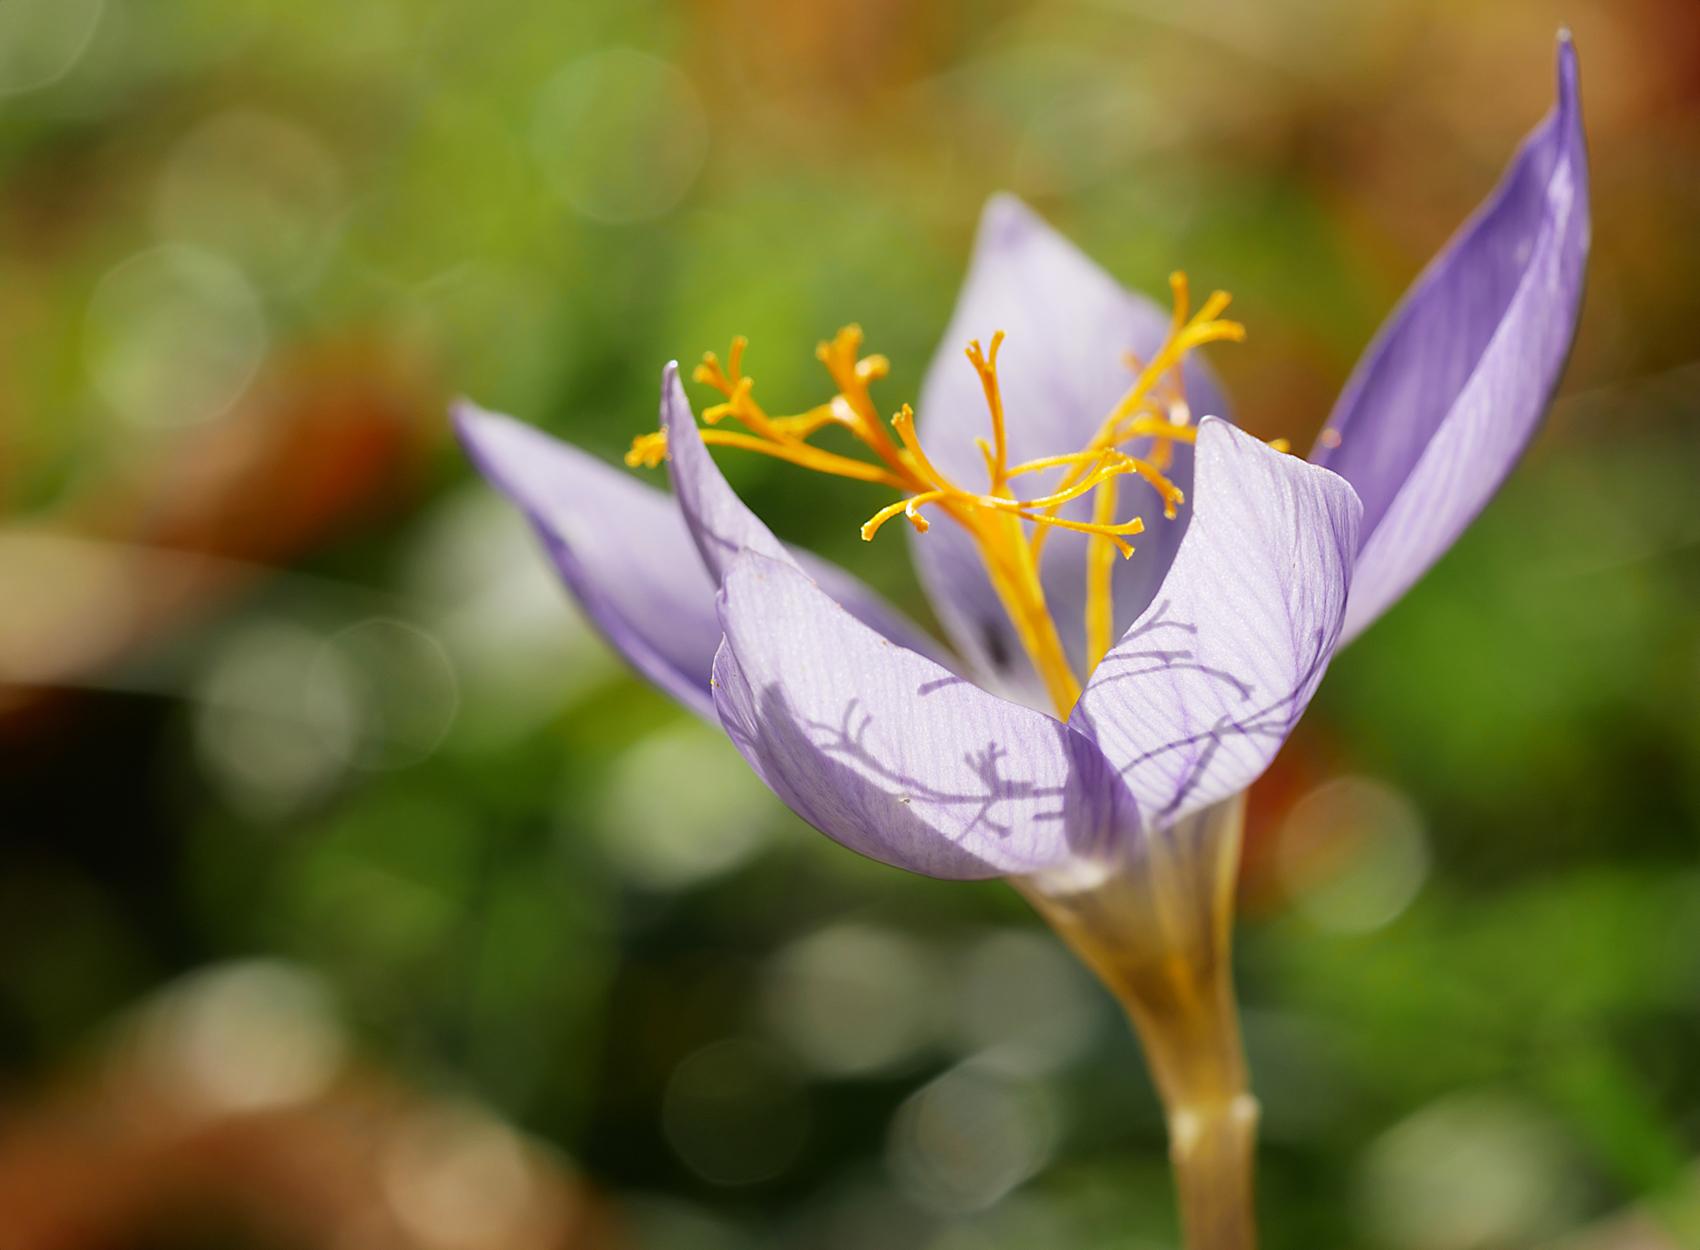 Pracht-Herbst-Krokus03 (Crocus speciosus)